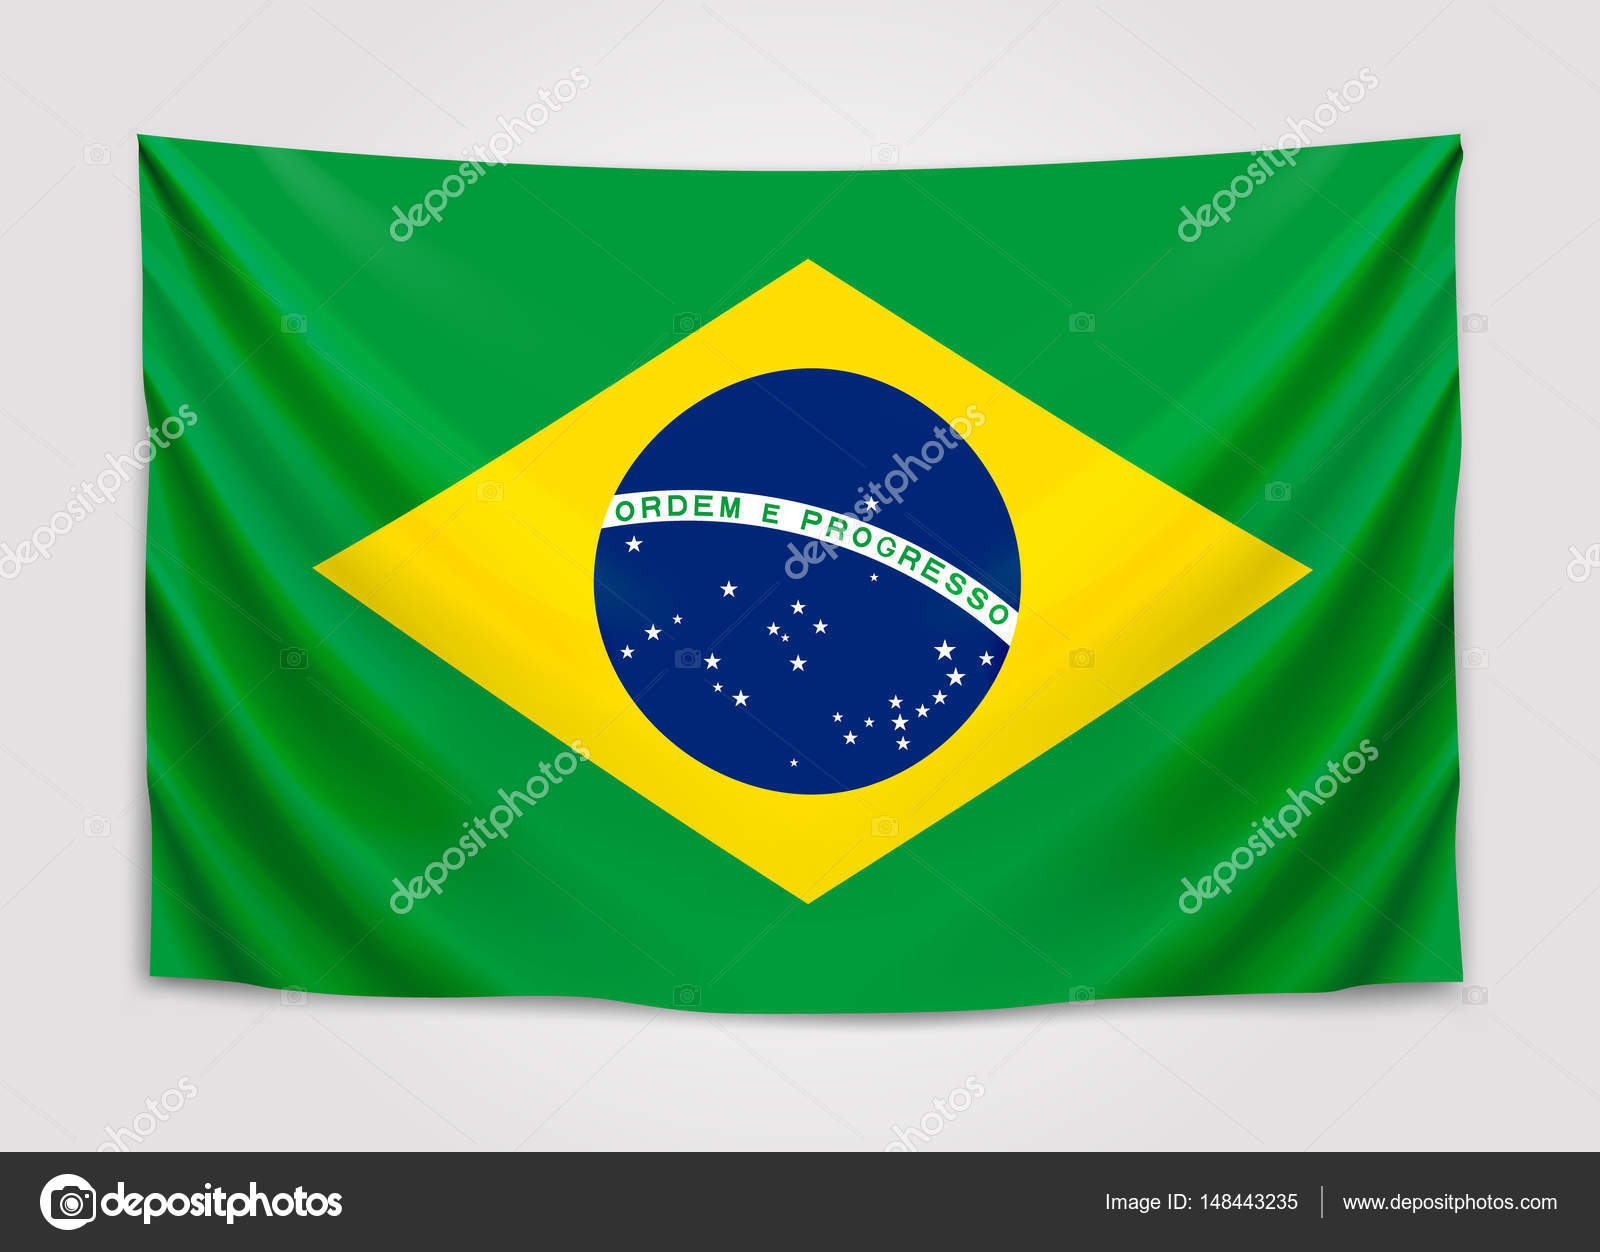 Hanging Flag Of Brazil Federative Republic Of Brazil Brazilian - Federative republic of brazil map